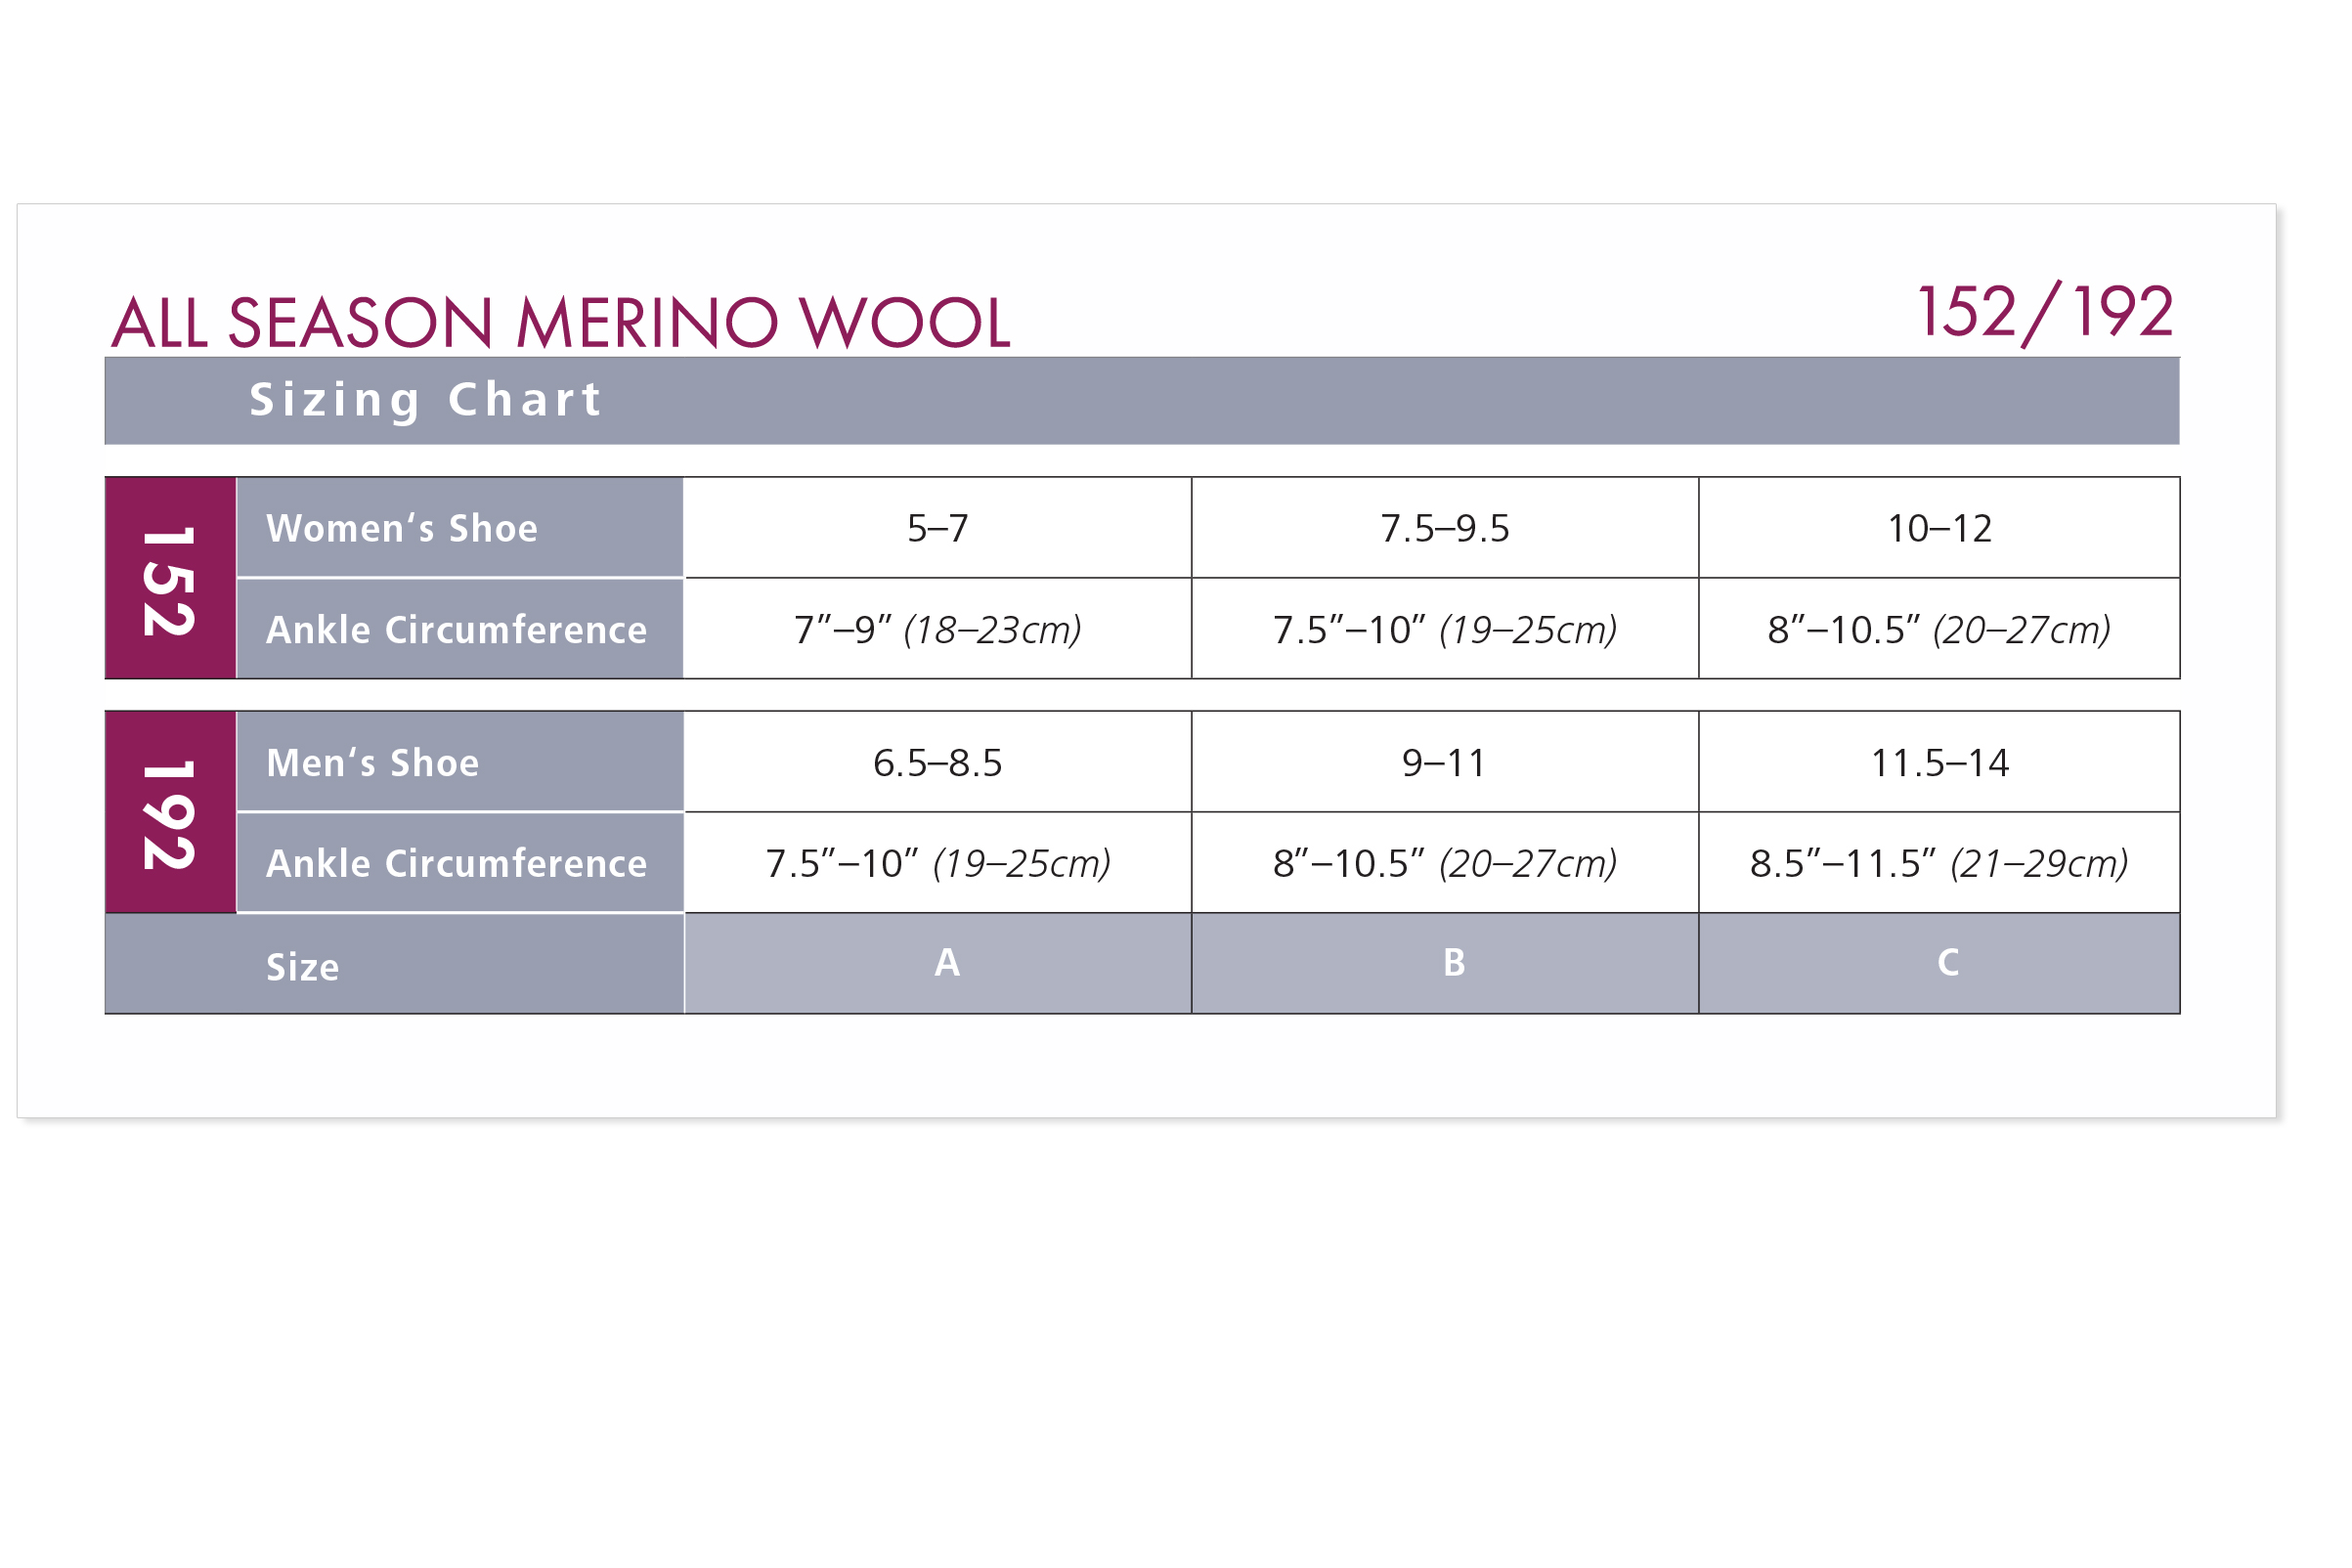 sigvaris-all-season-merino-wool-sizing-chart-2.jpg